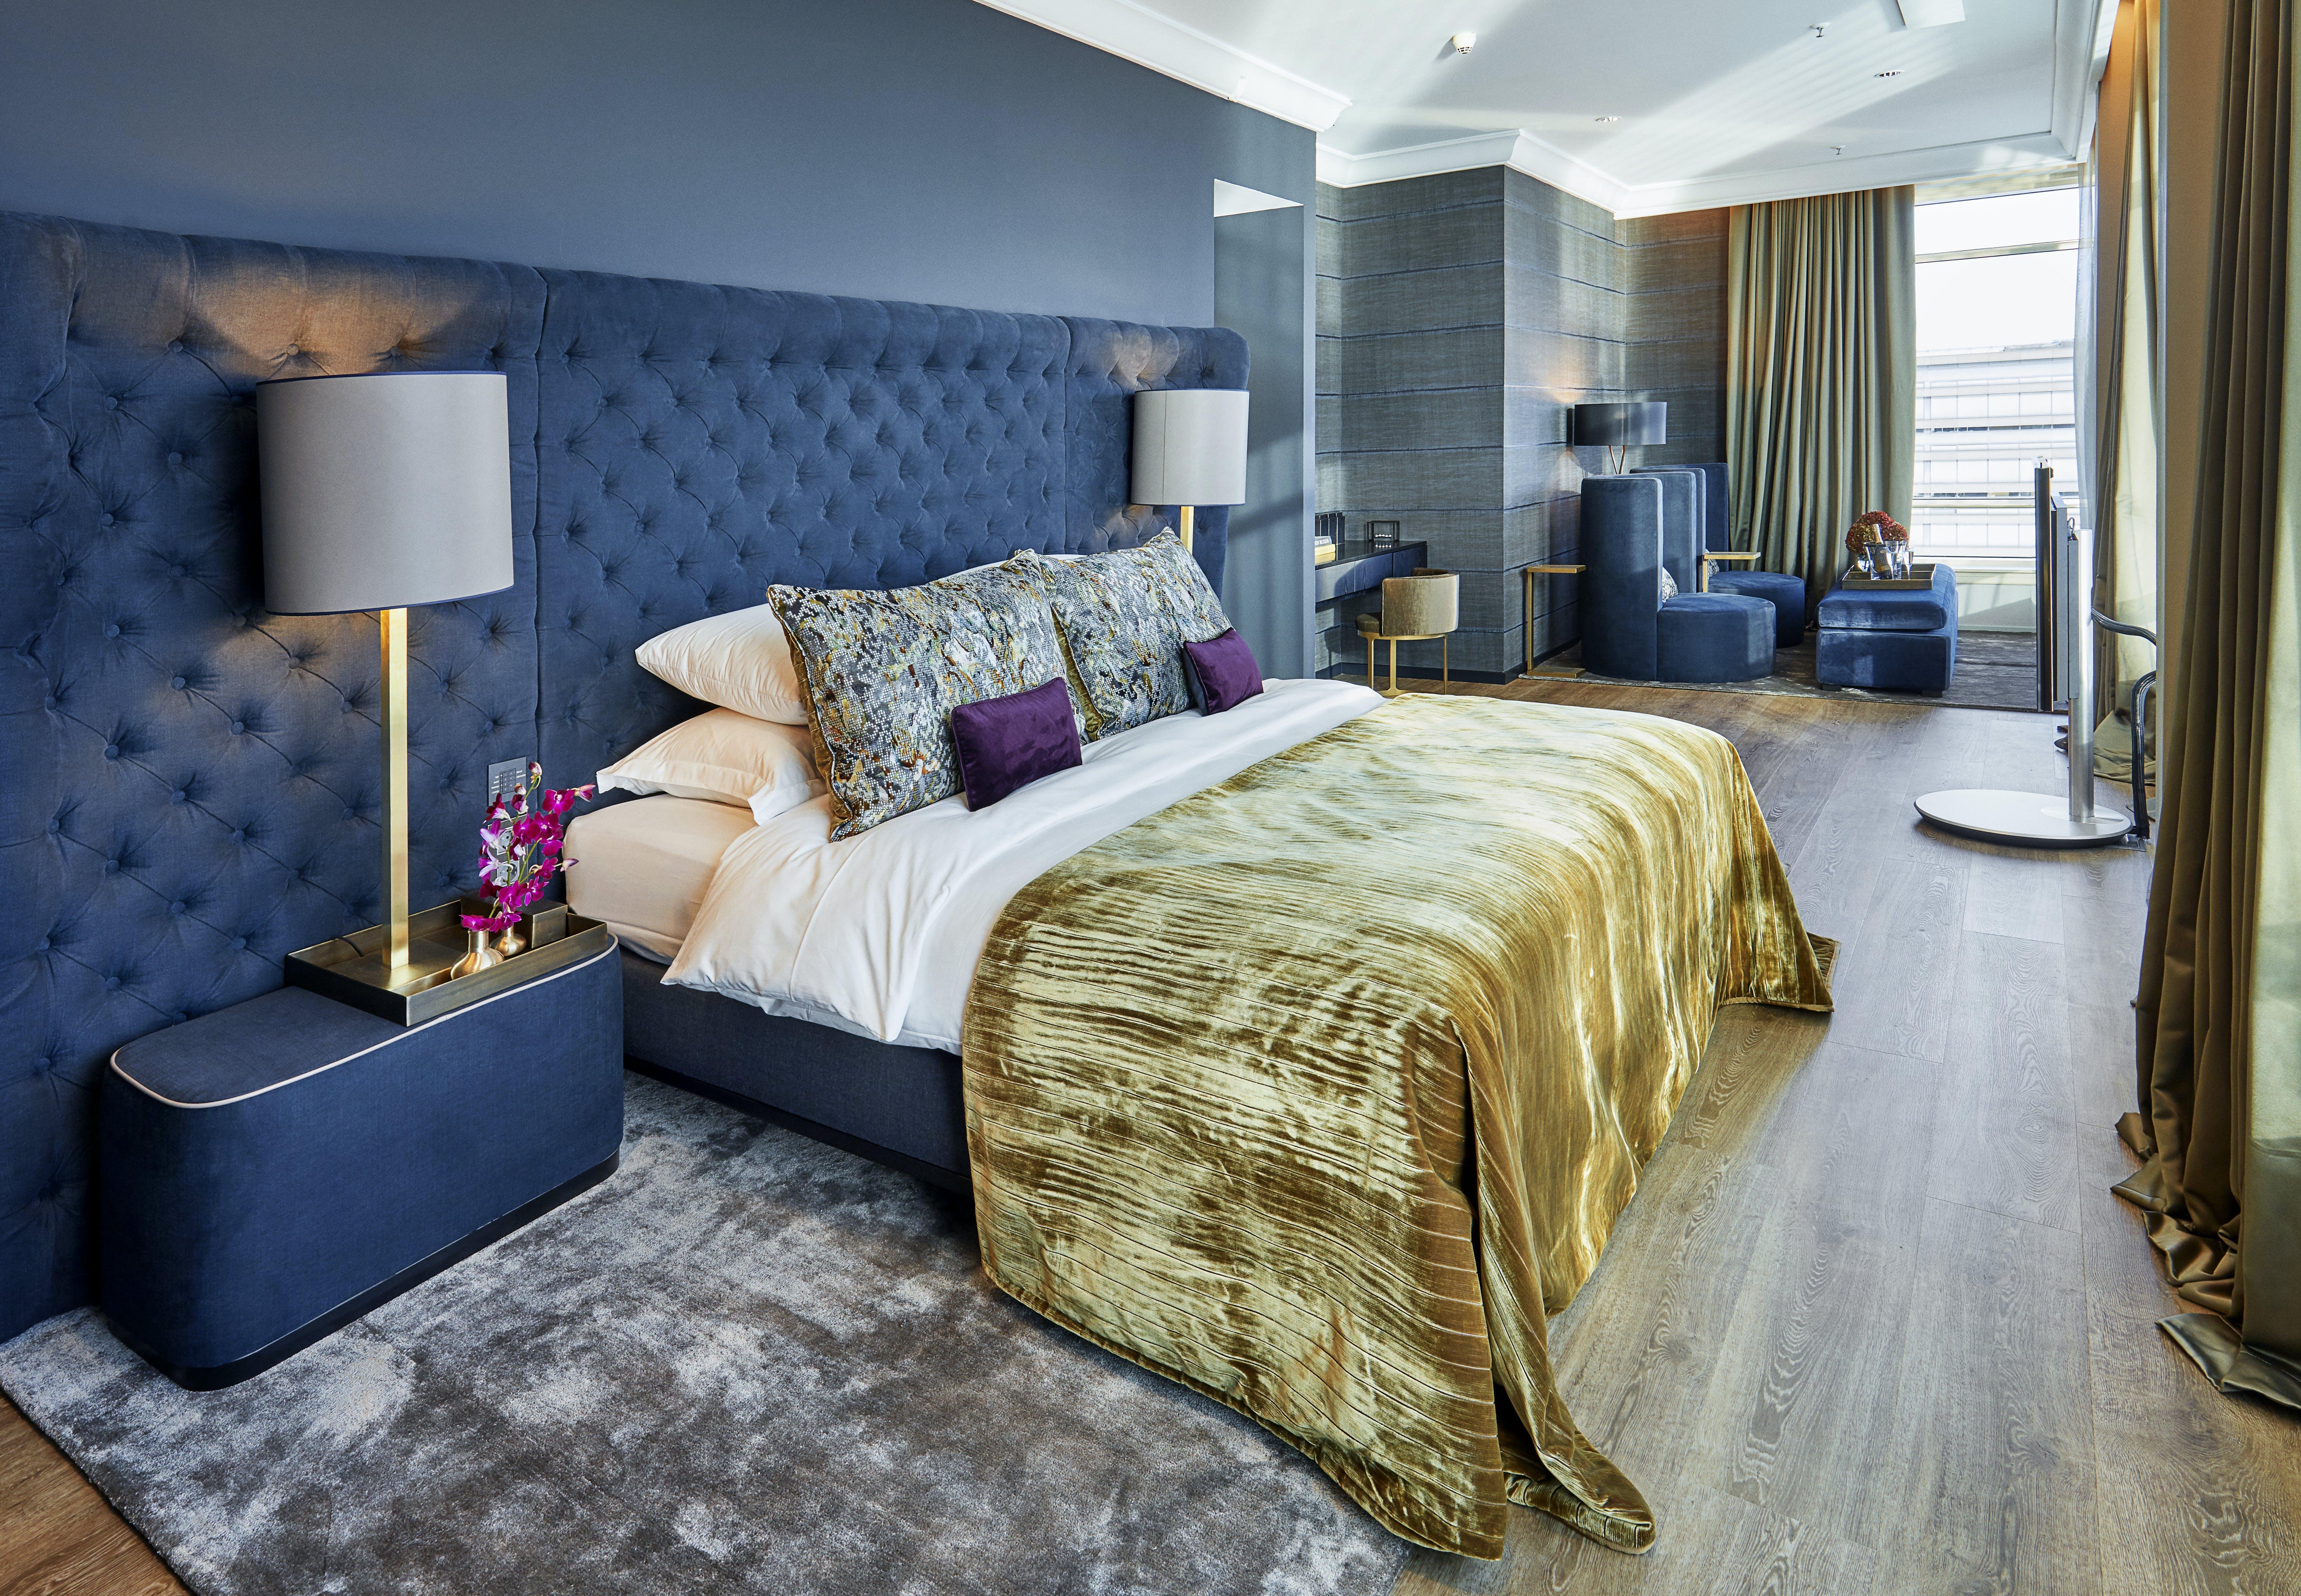 Copenhagen Marriott royal suite københavn